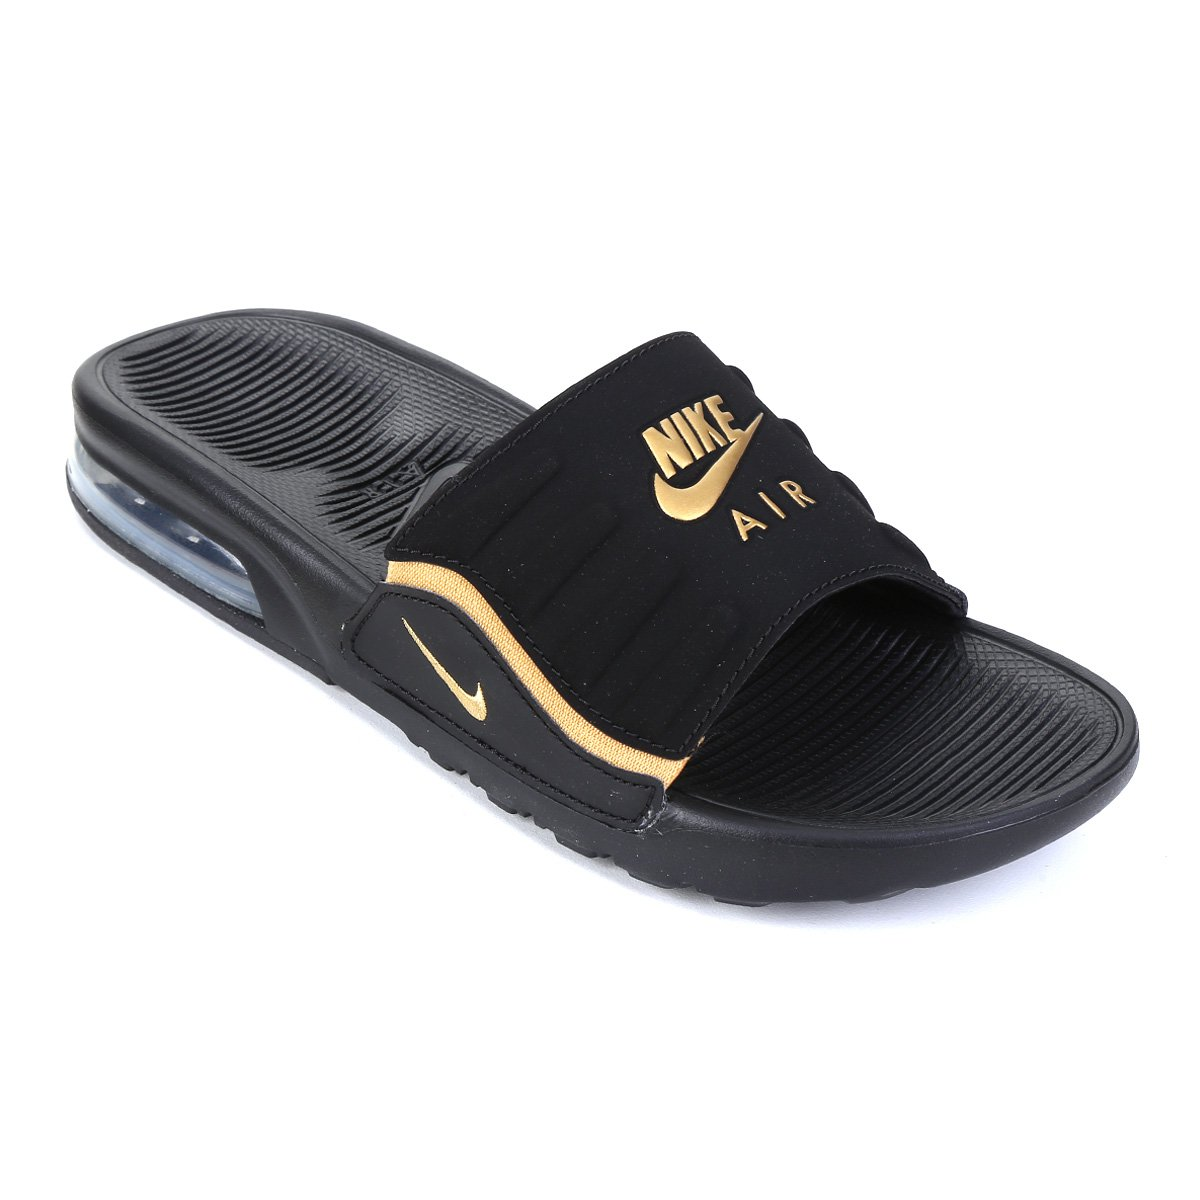 Chinelo Nike Air Max Camden Slide Feminino Preto E Dourado